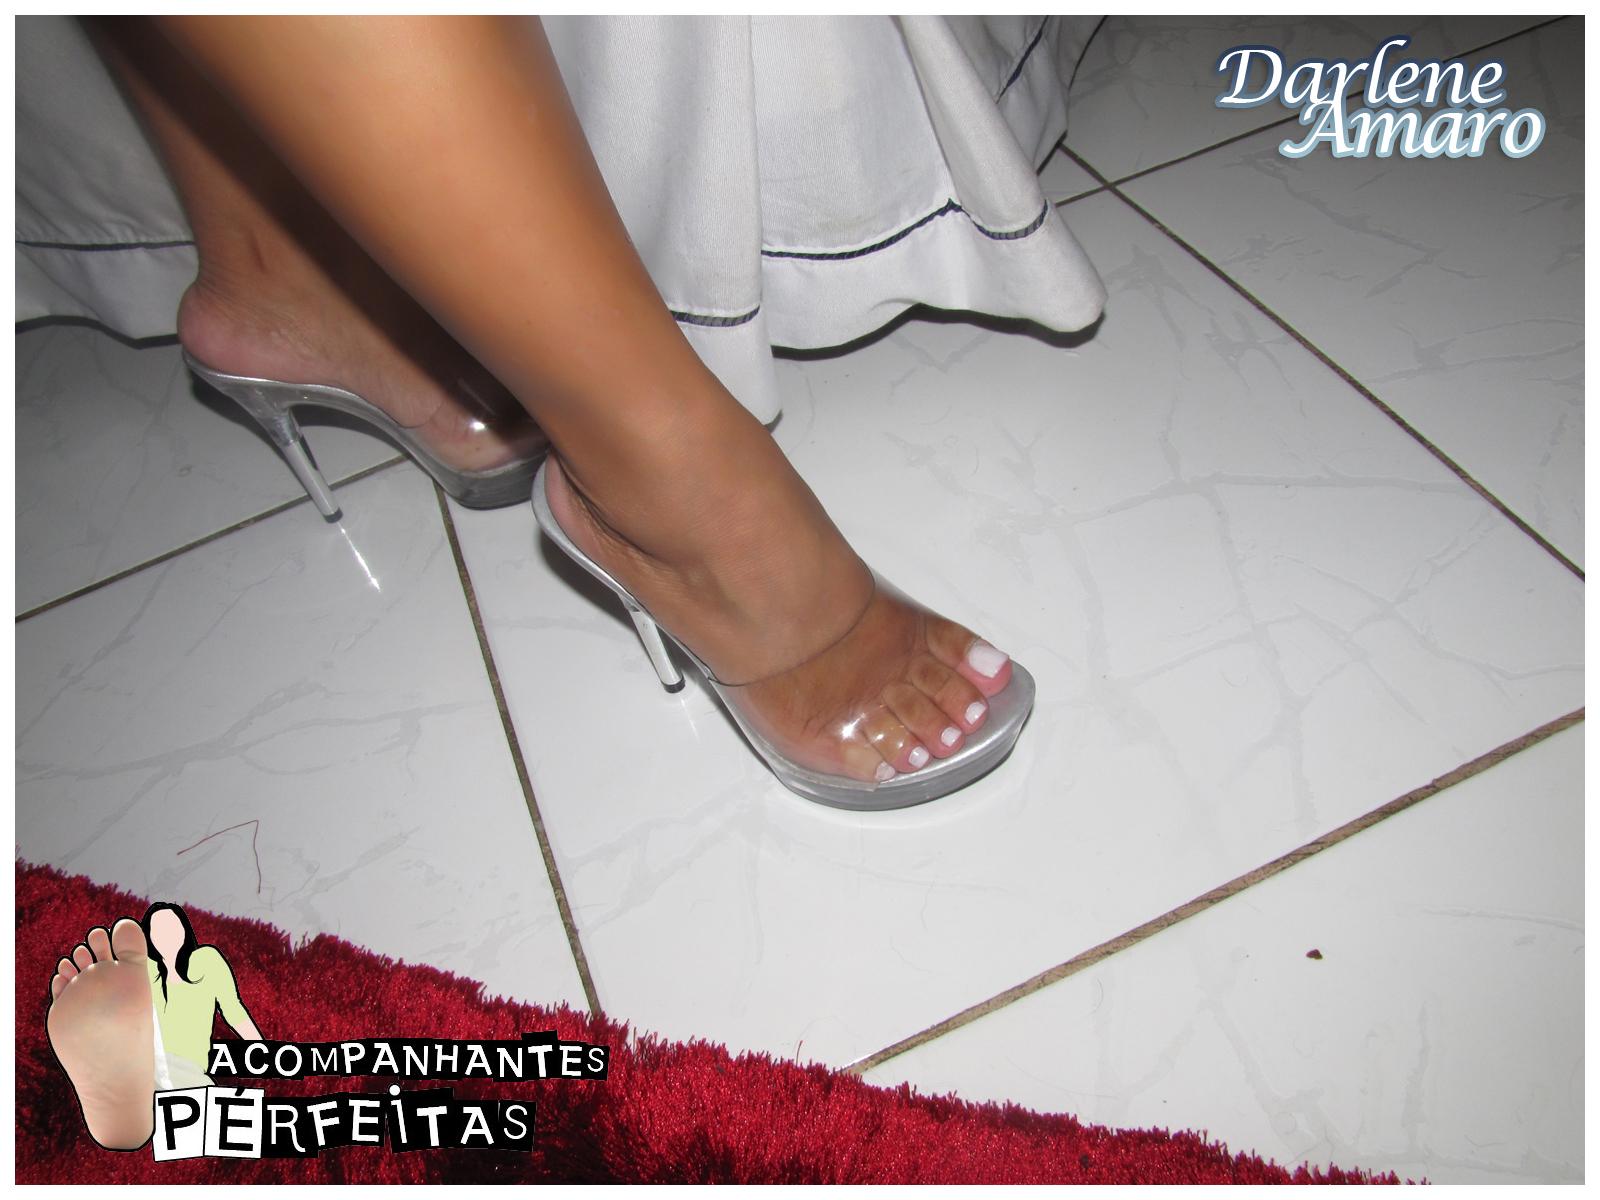 feet Darlene amaro